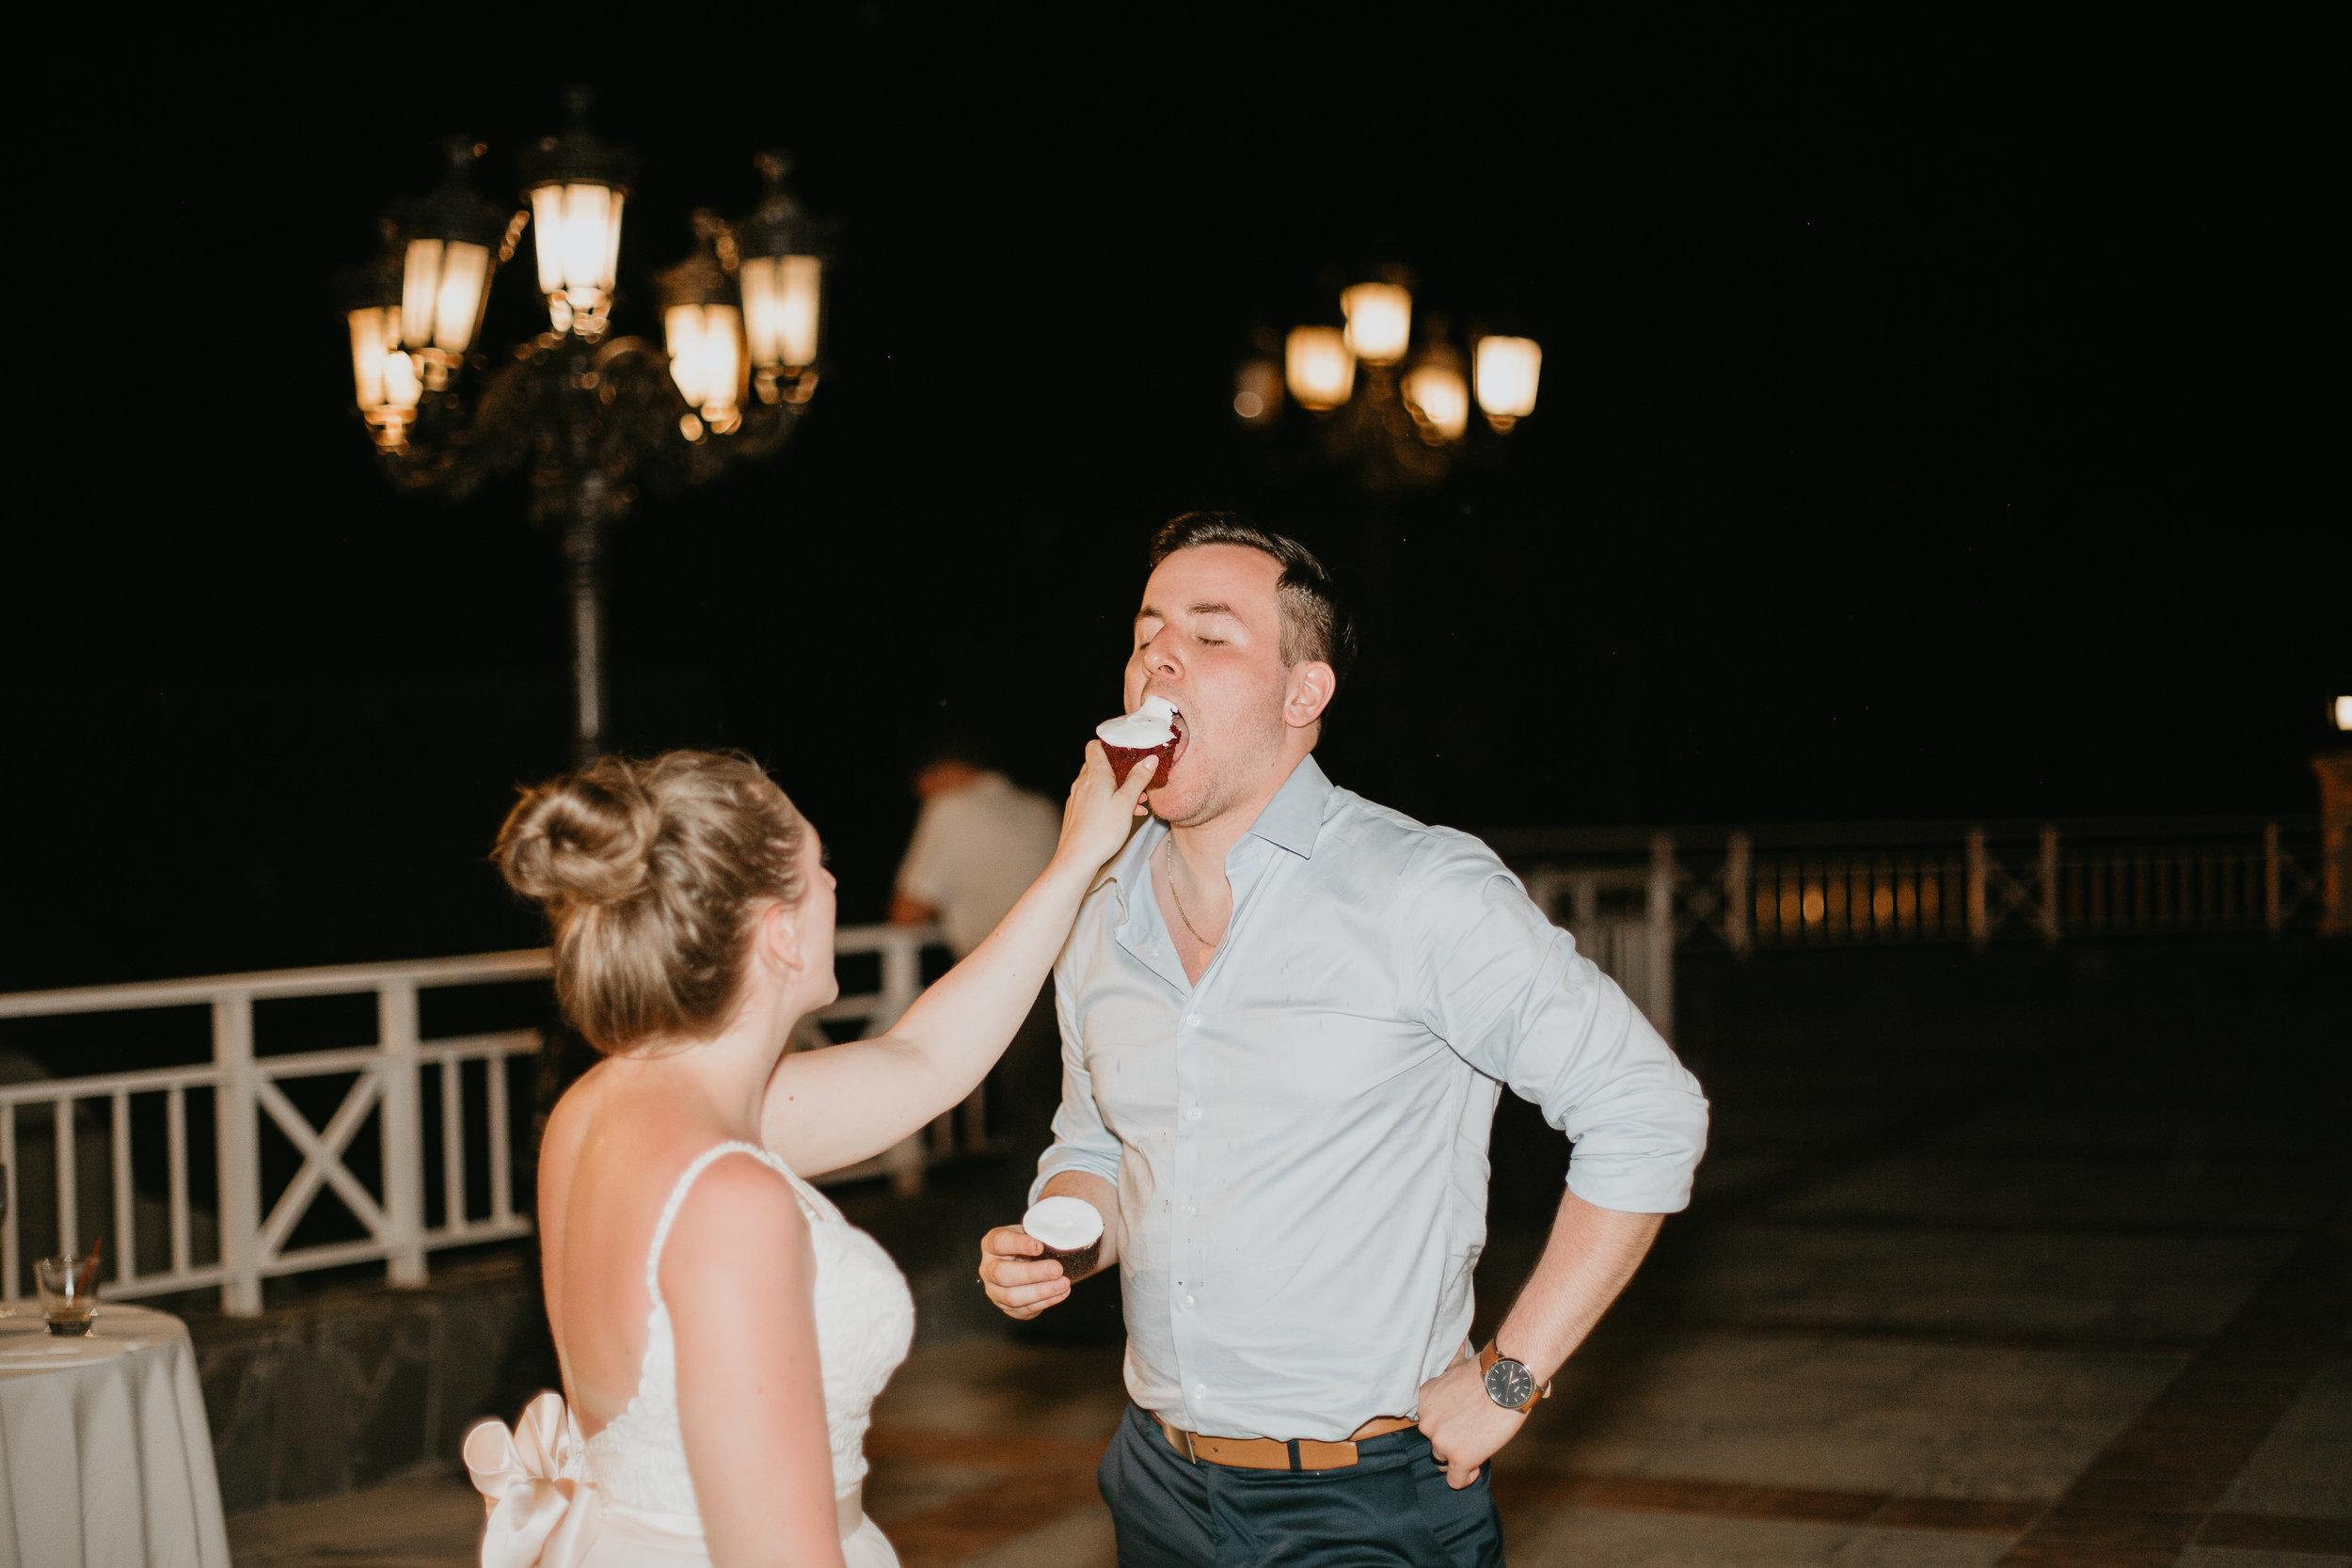 nicole-daacke-photography-destination-wedding-in-st-lucia-sandals-la-toc-intimate-island-wedding-carribean-elopement-photographer-chill-island-wedding-180.jpg